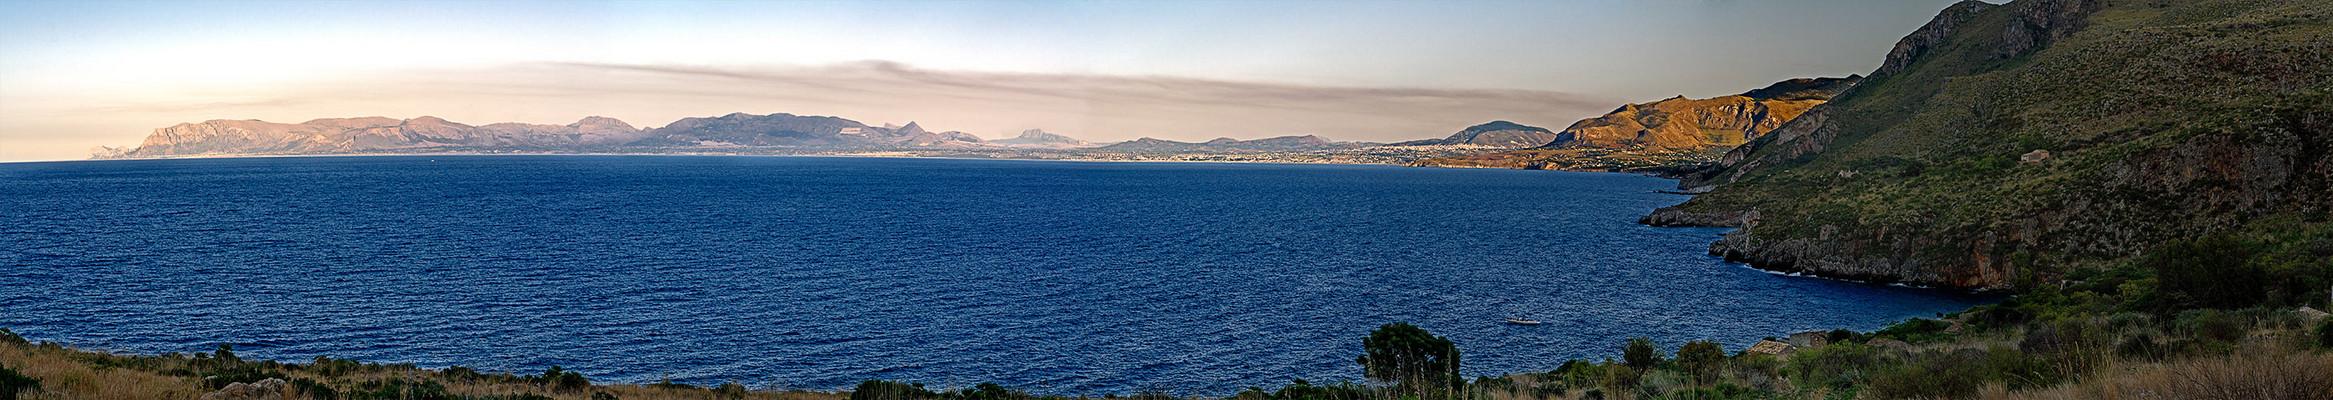 Golfo de Castellmare